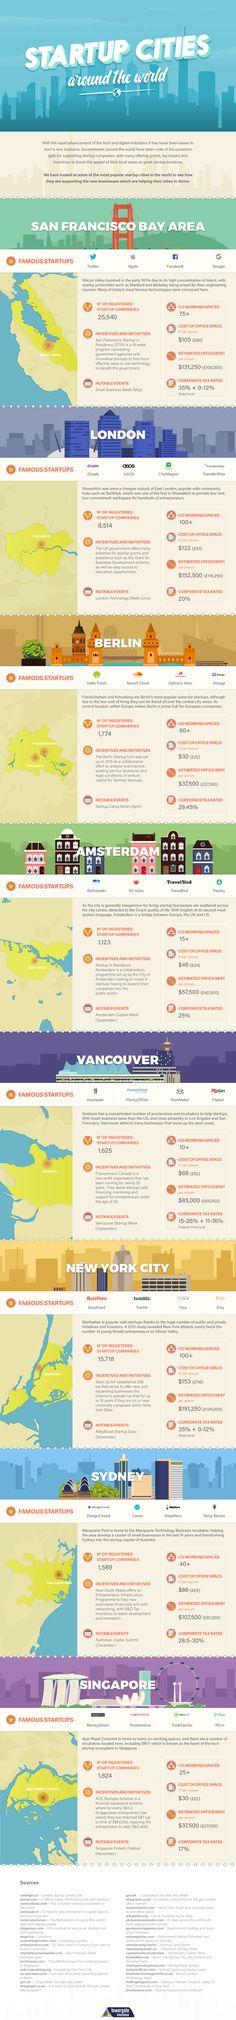 Best Startup Cities Around the World #Infographic #Startup #Travel